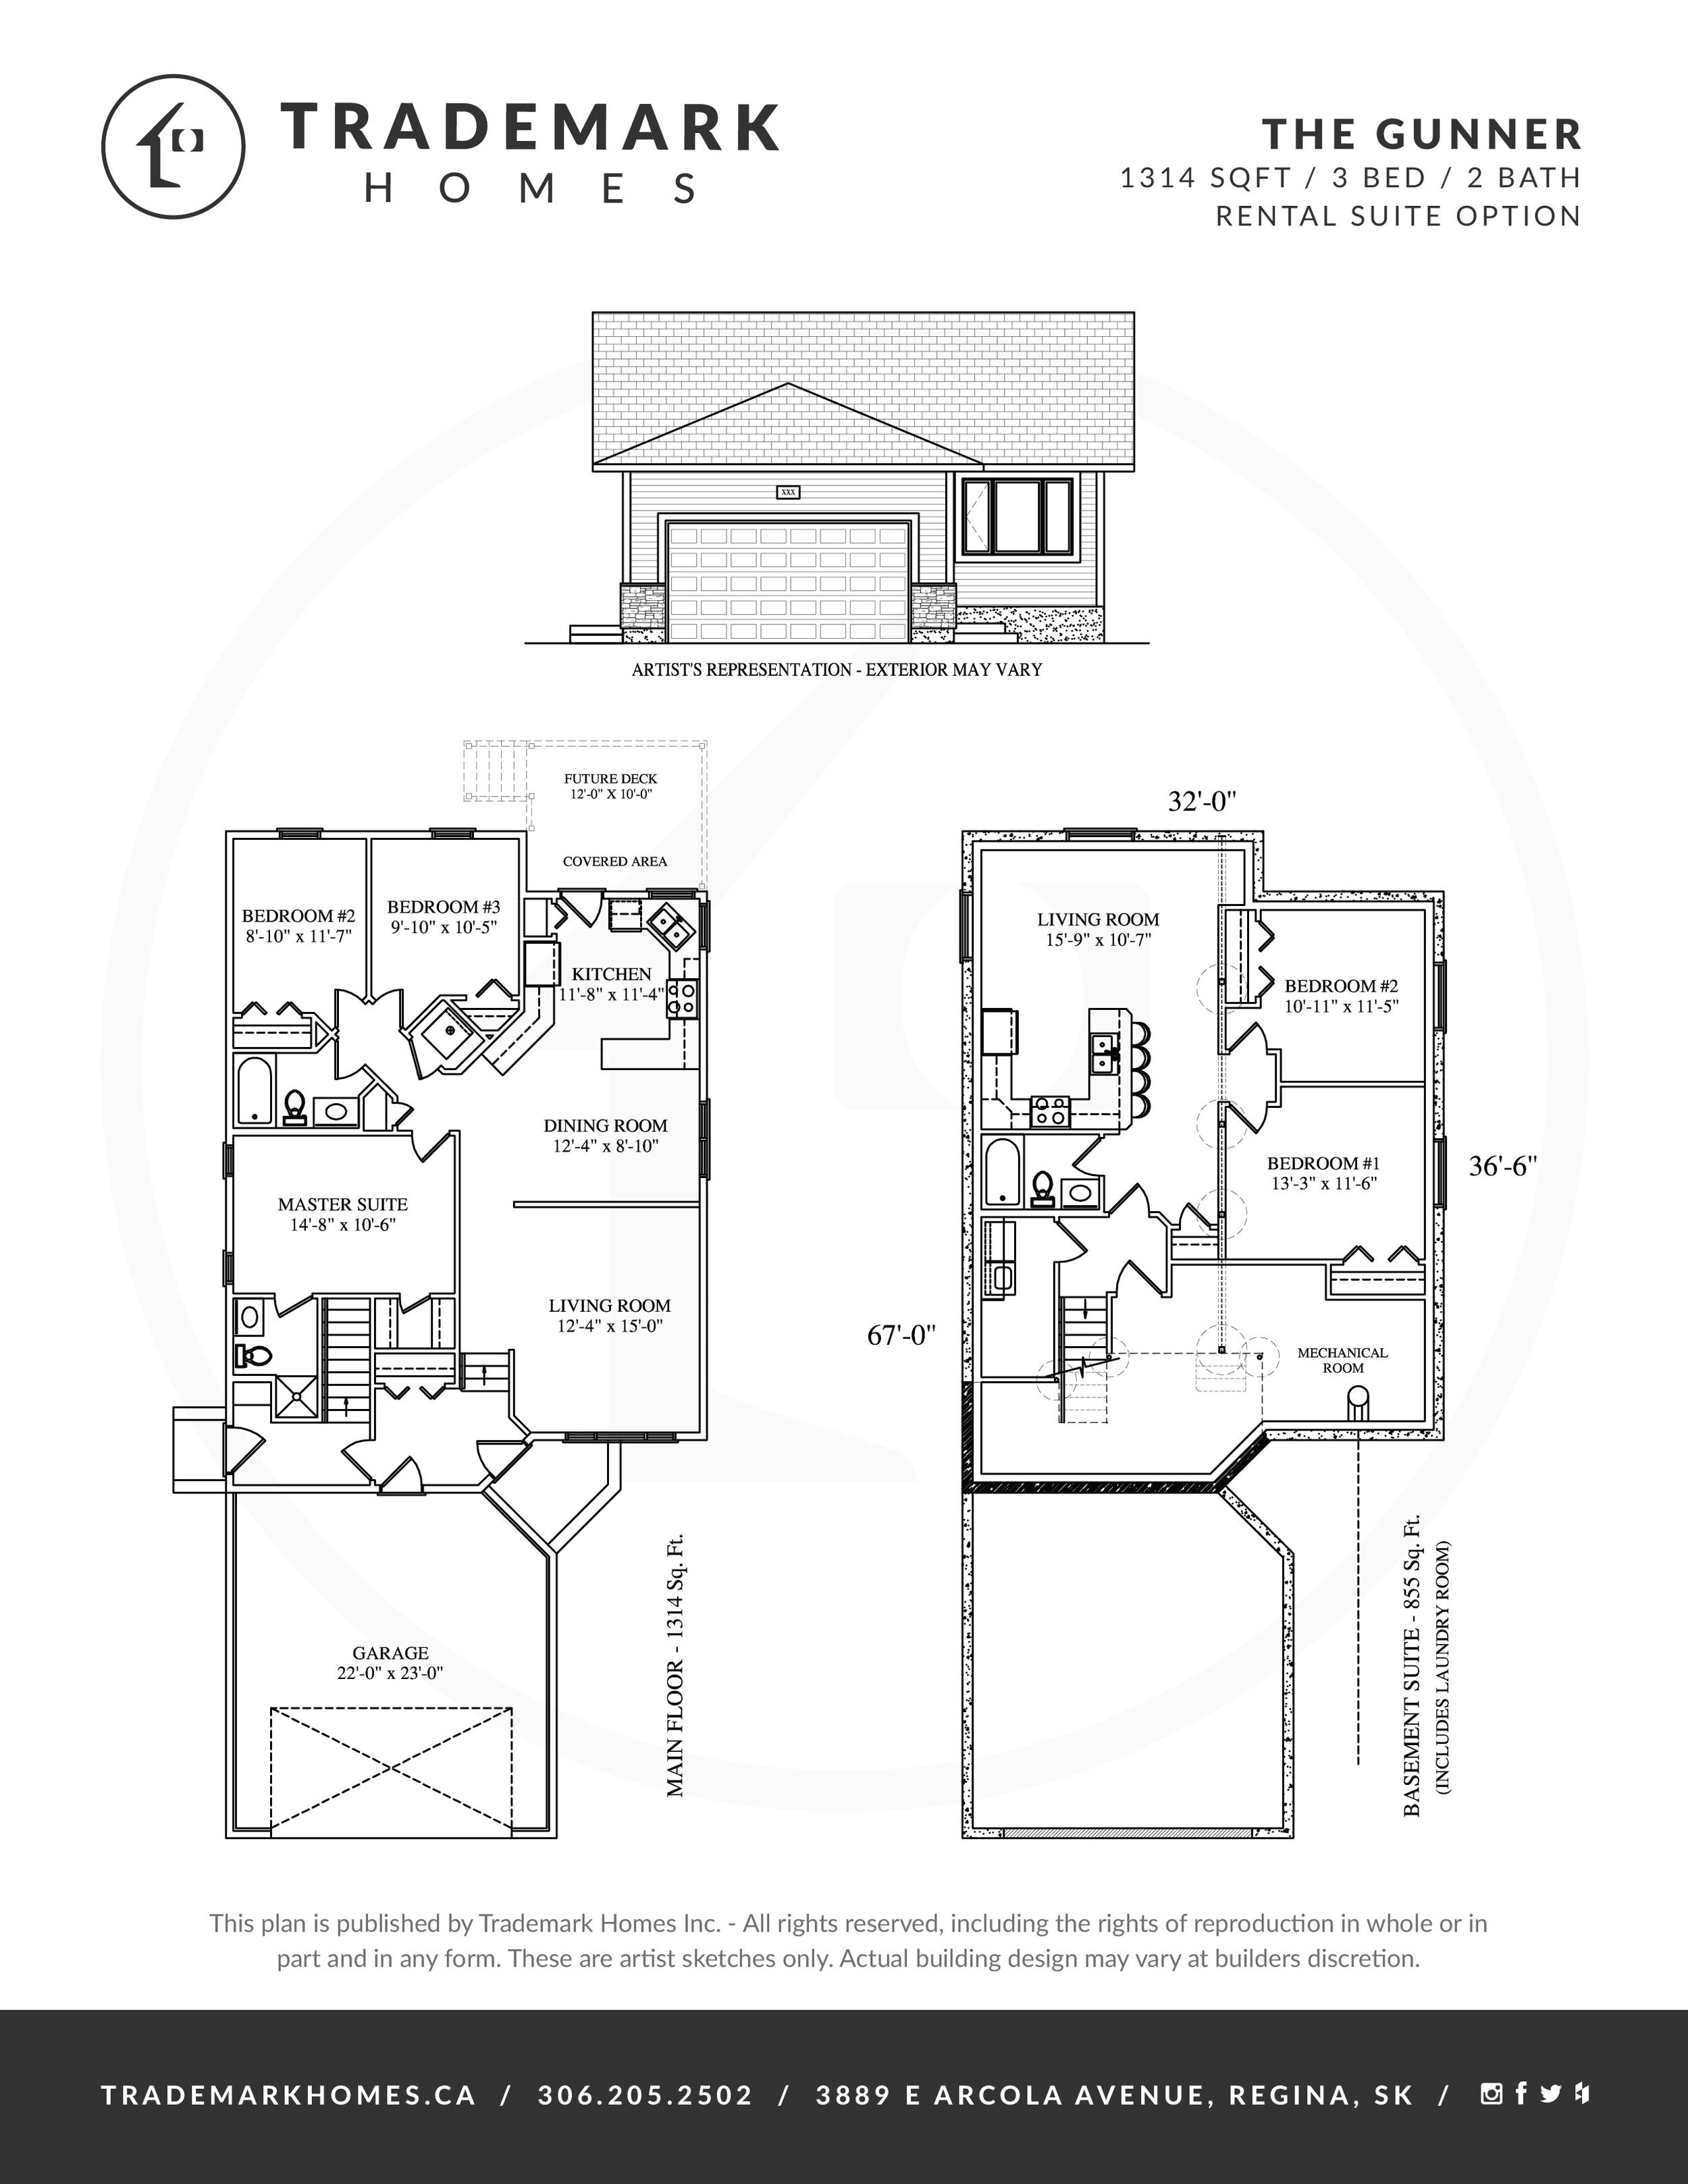 Trademark Homes The Aspen Bungalow